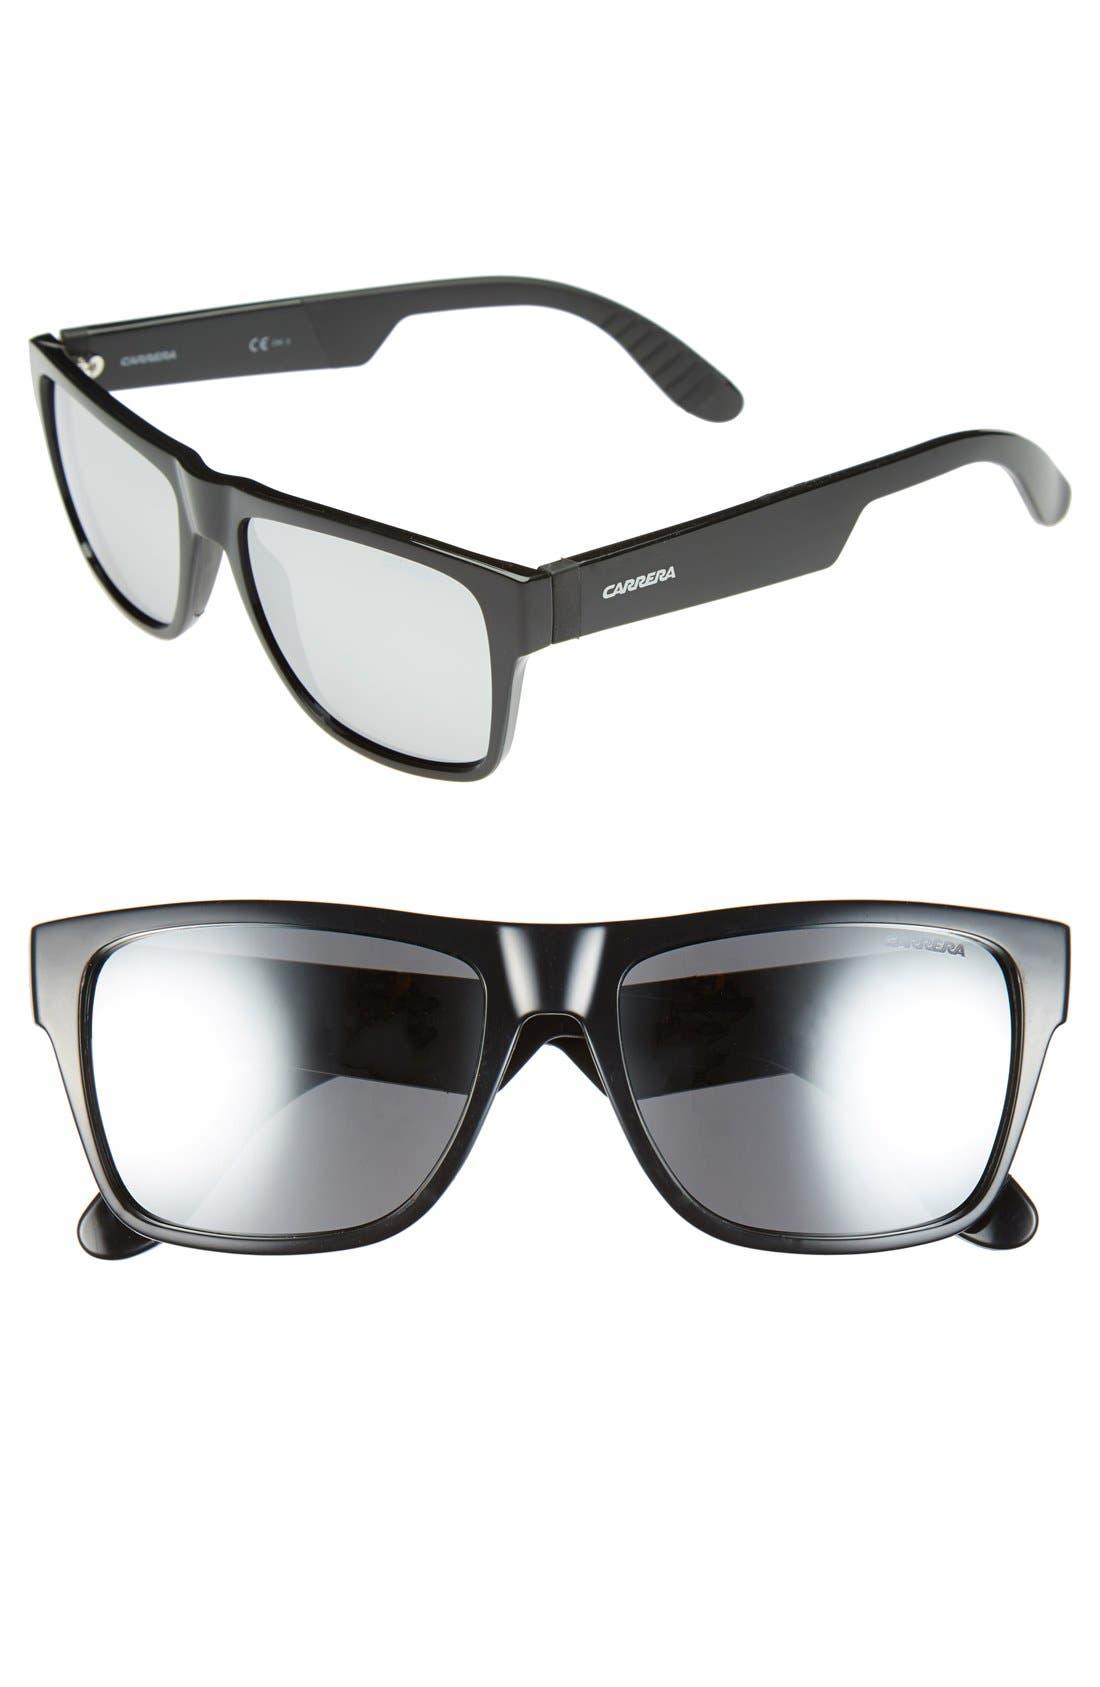 Main Image - Carrera Eyewear 58mm Retro Sunglasses